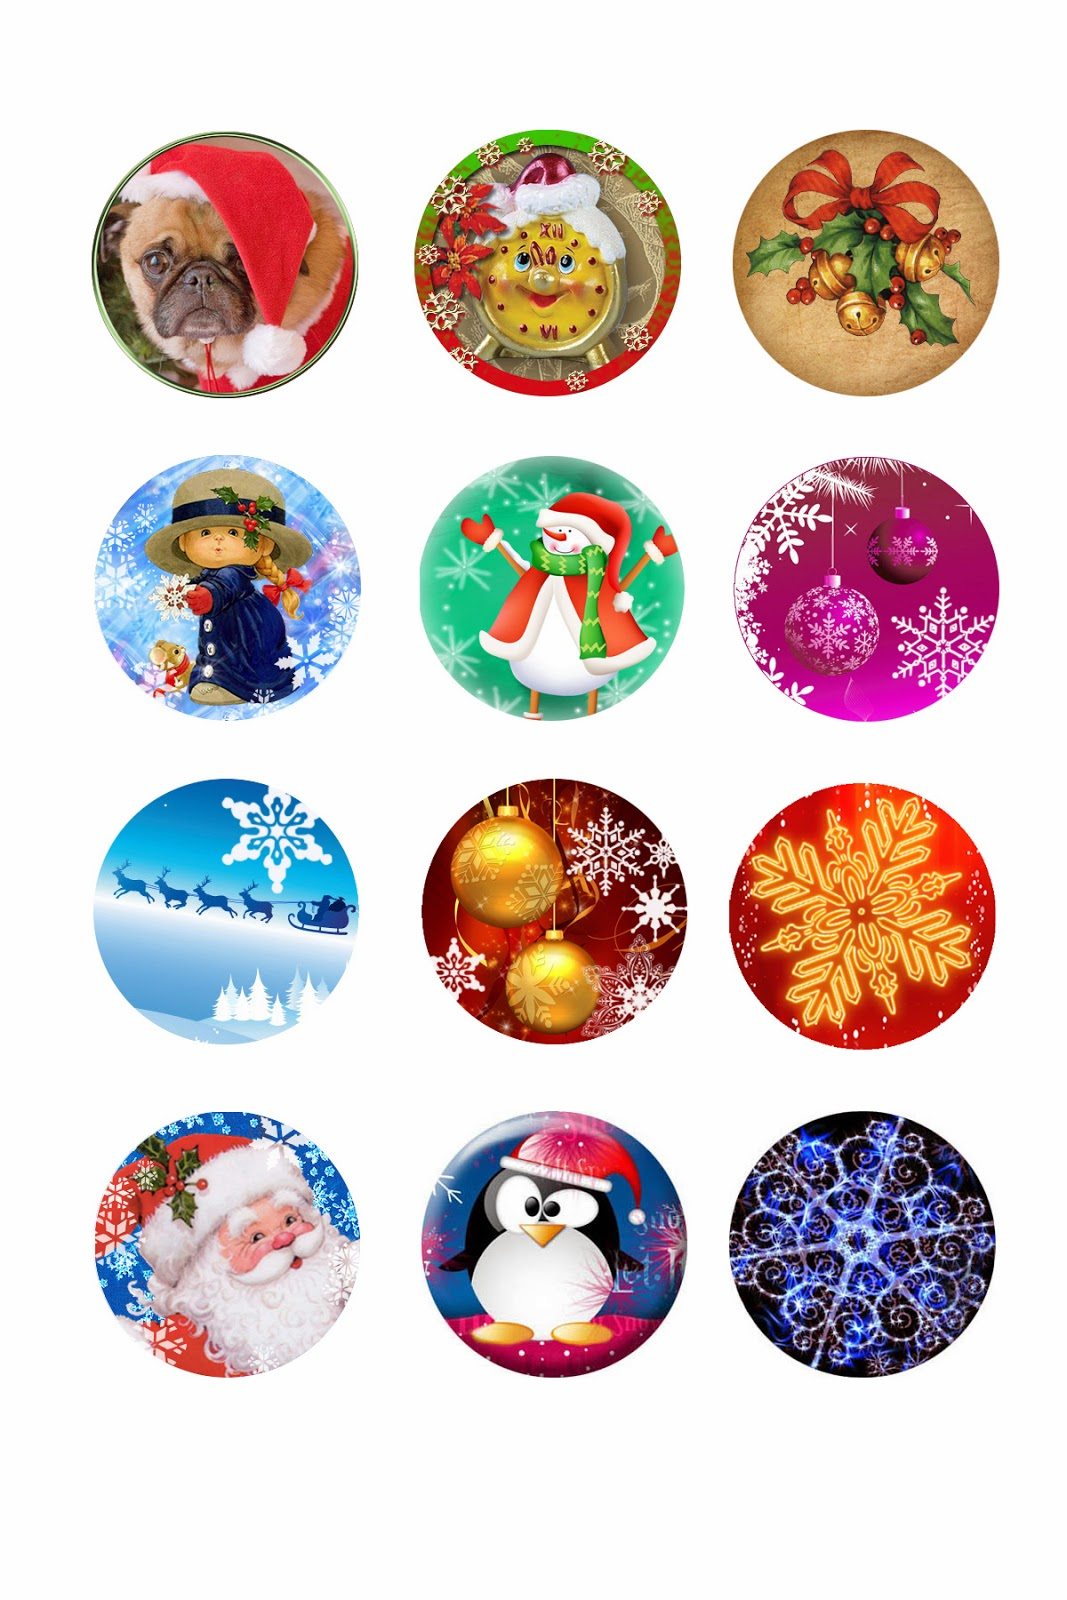 Christmas tree bottle cap ornament template plus 73 new for Bottle cap christmas crafts